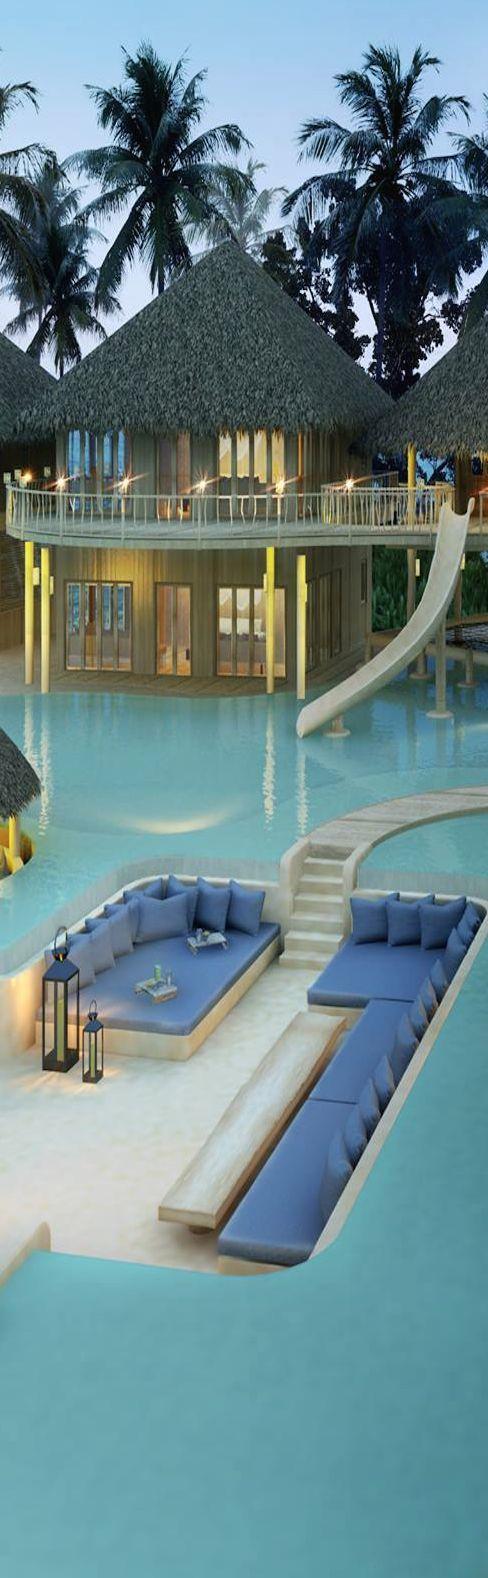 Pool, Maldives Islands